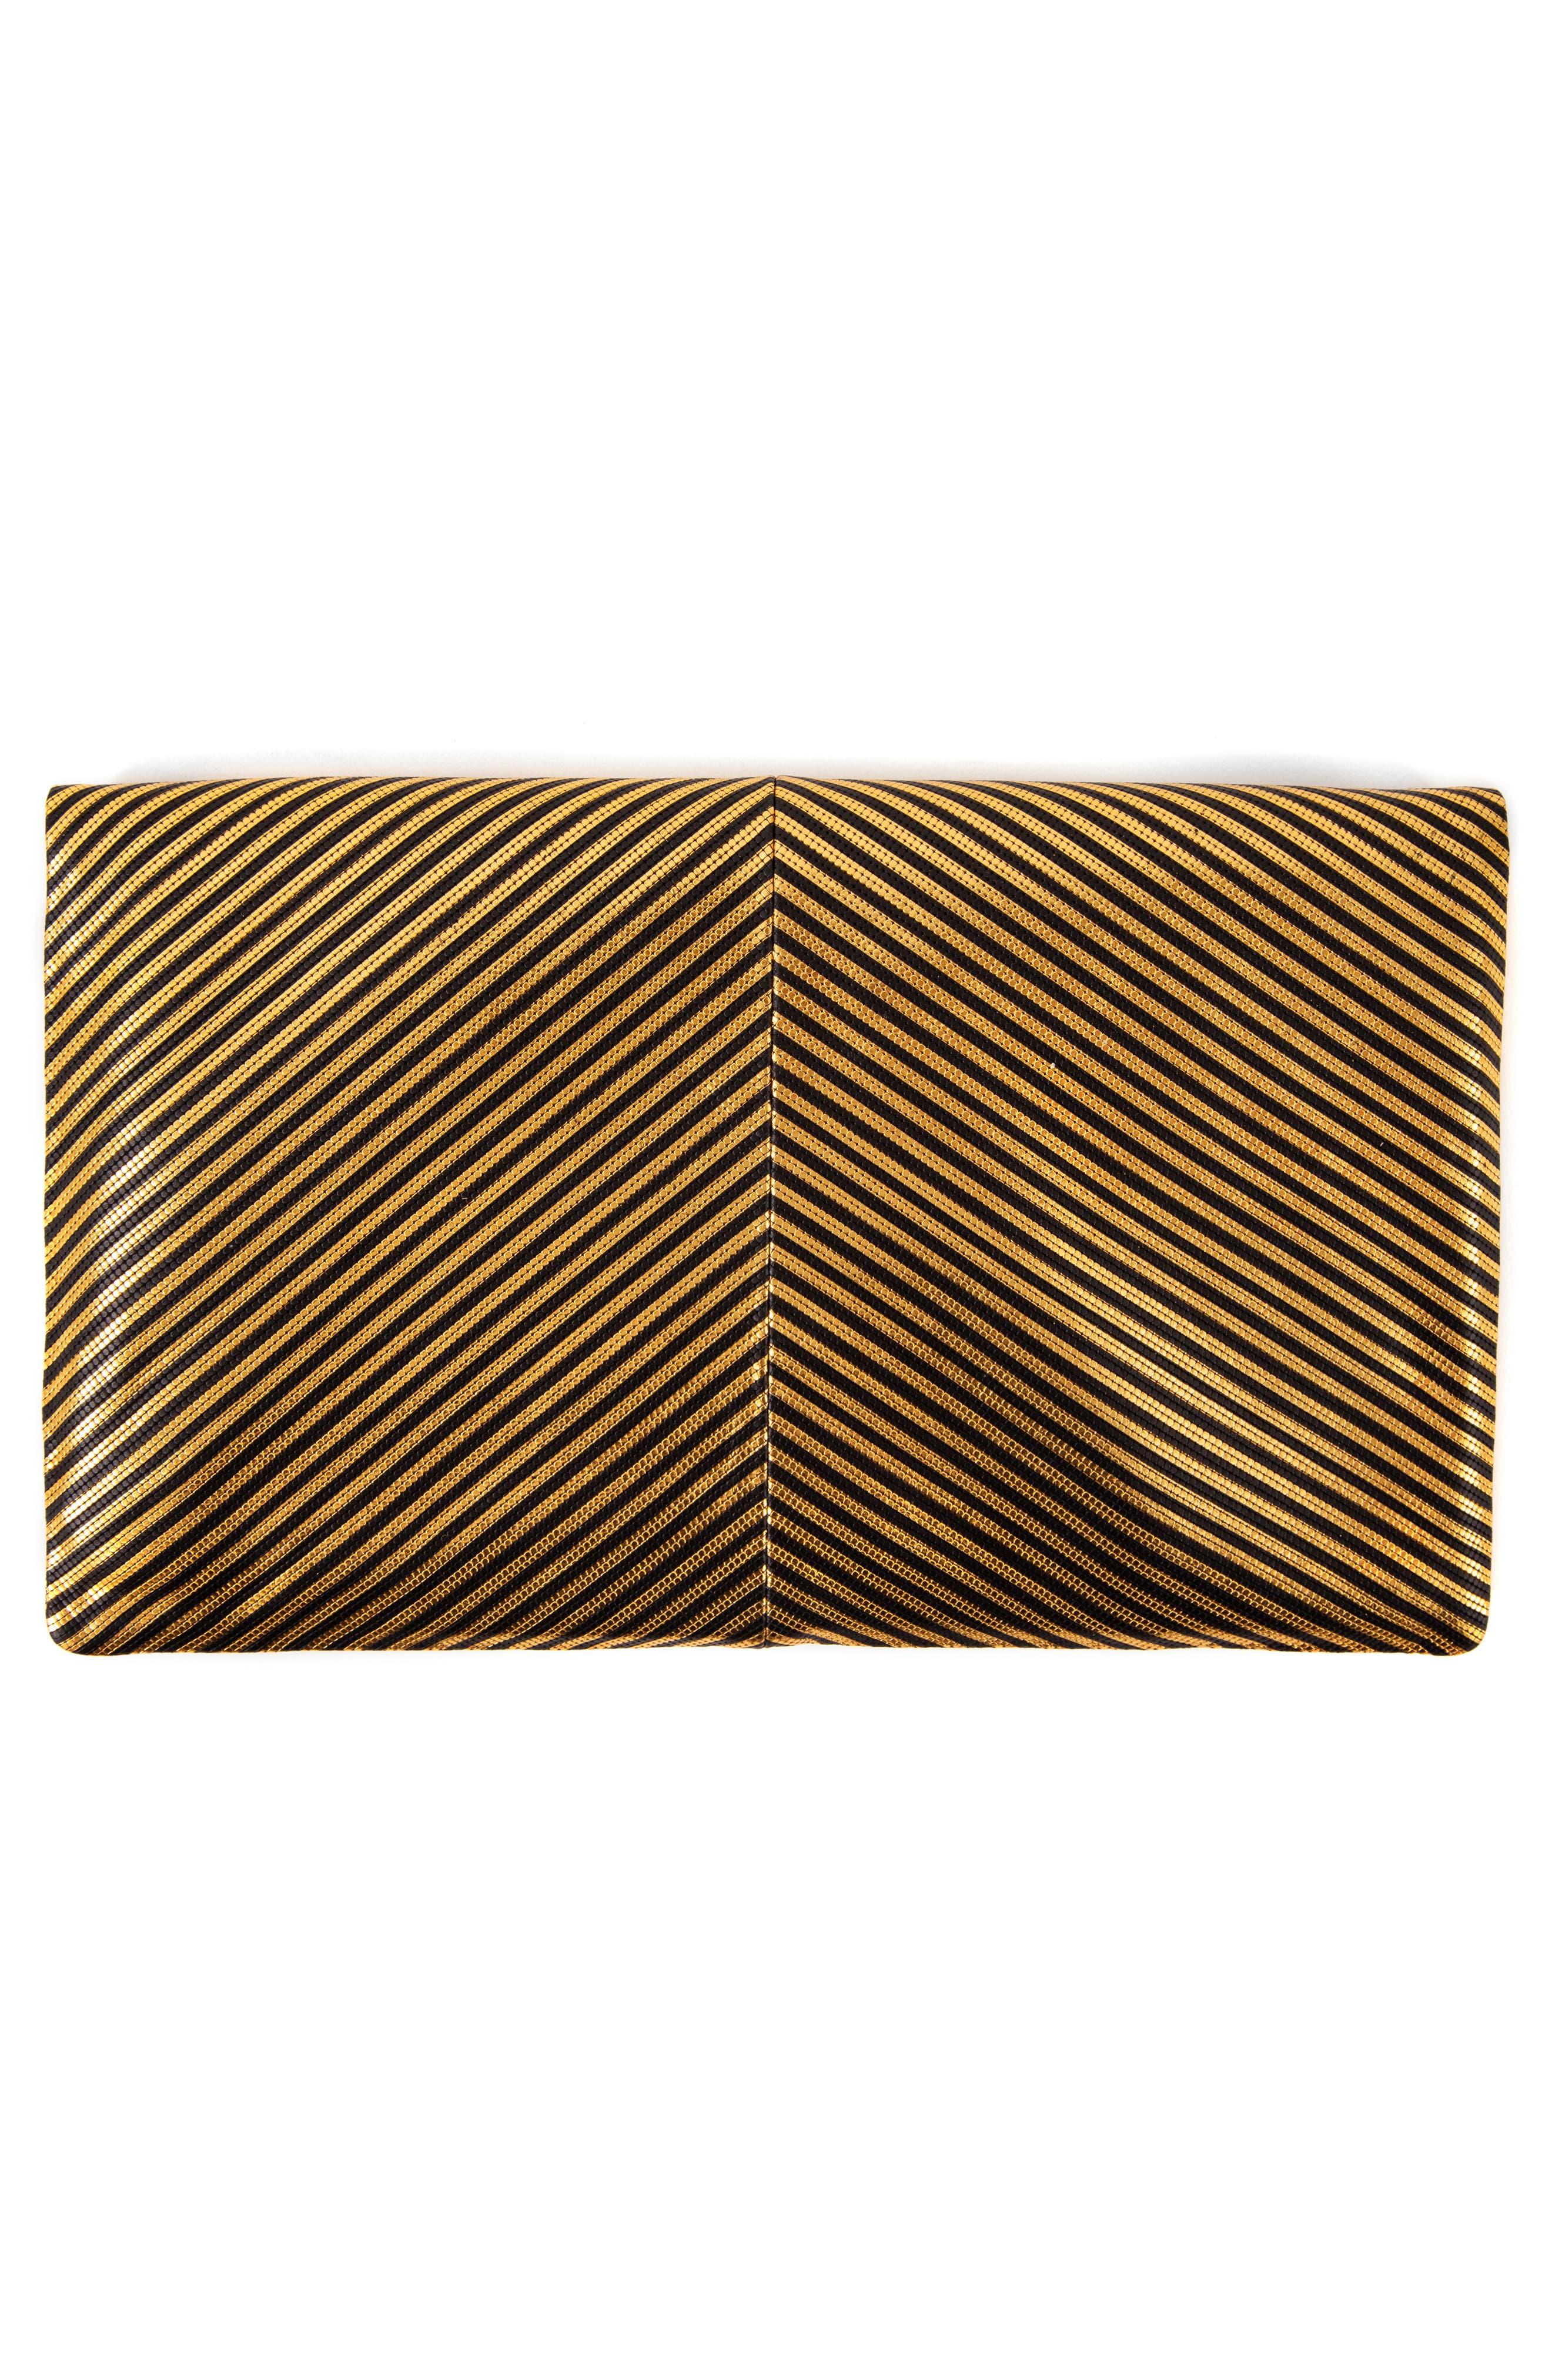 Disco Stripe Foldover Clutch,                             Alternate thumbnail 2, color,                             DISCO STRIPE PATCHWORK BLACK